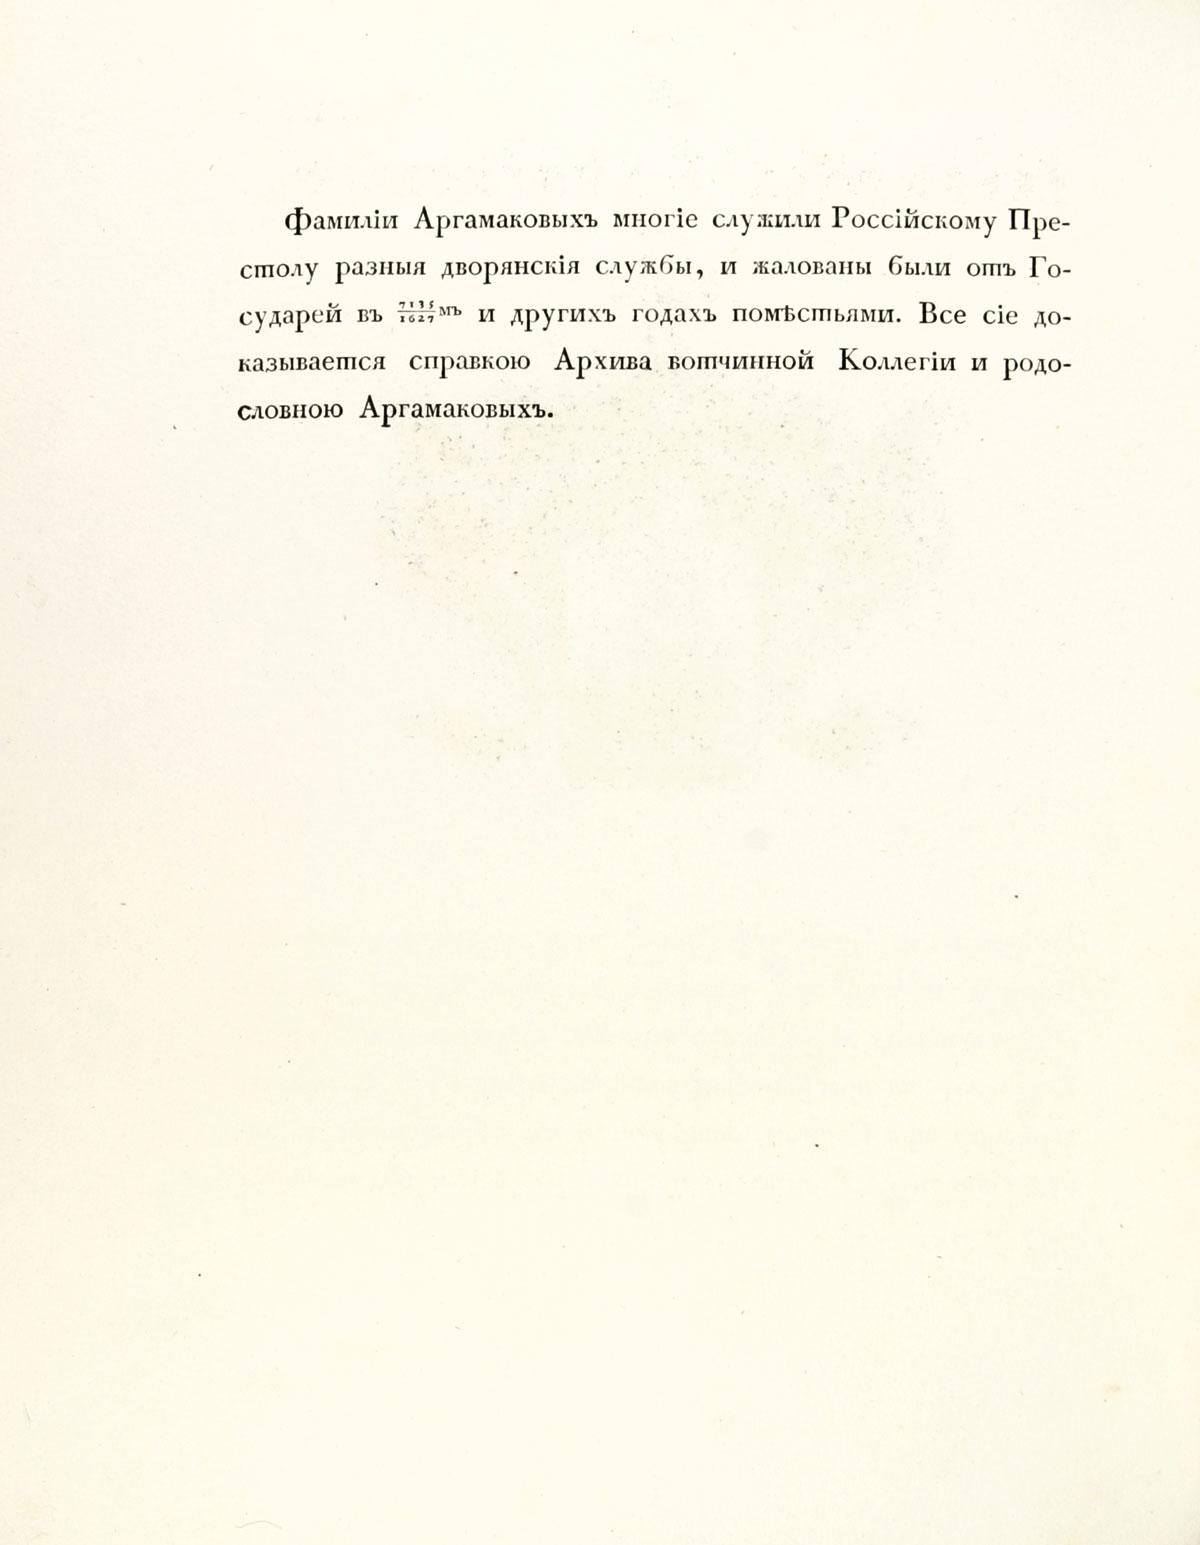 Герб рода Аргамаковых, стр. 2